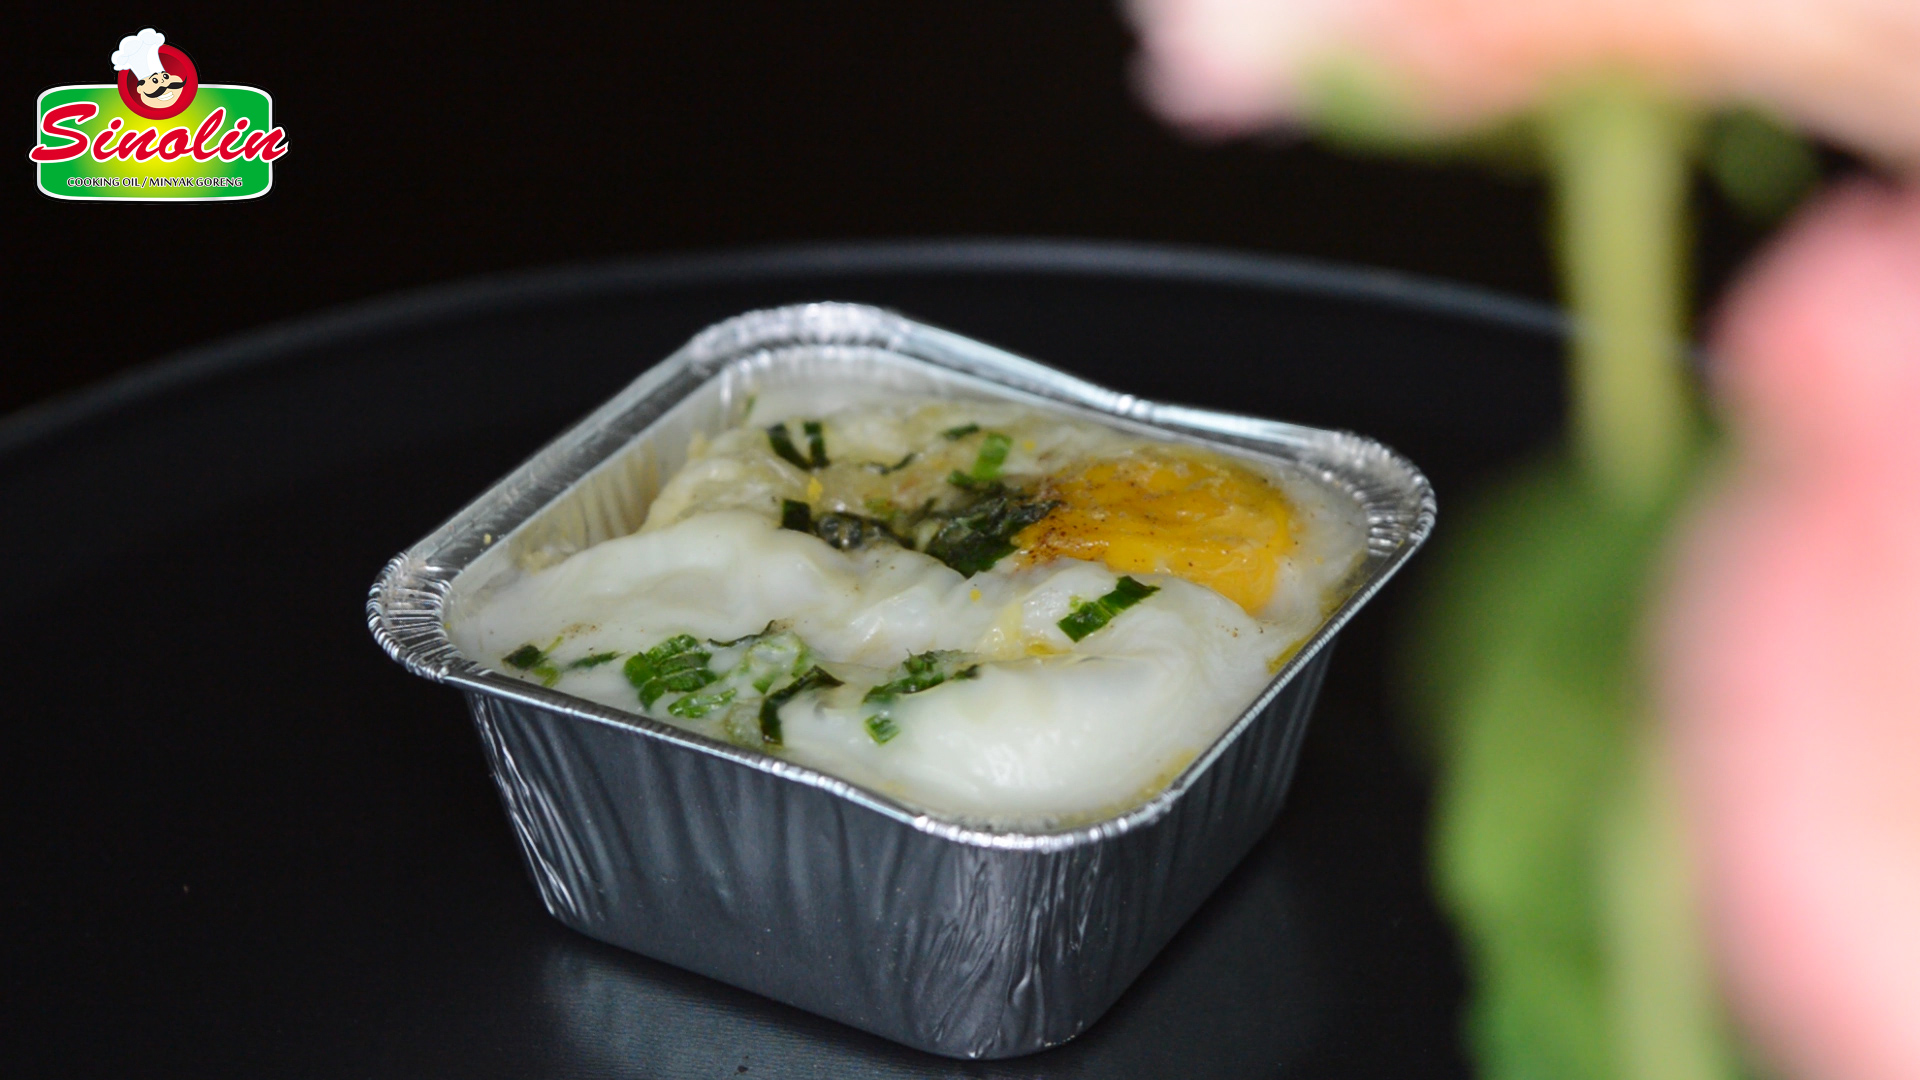 Egg Bread 계란빵 Gyeran-ppang By Dapur Sinolin